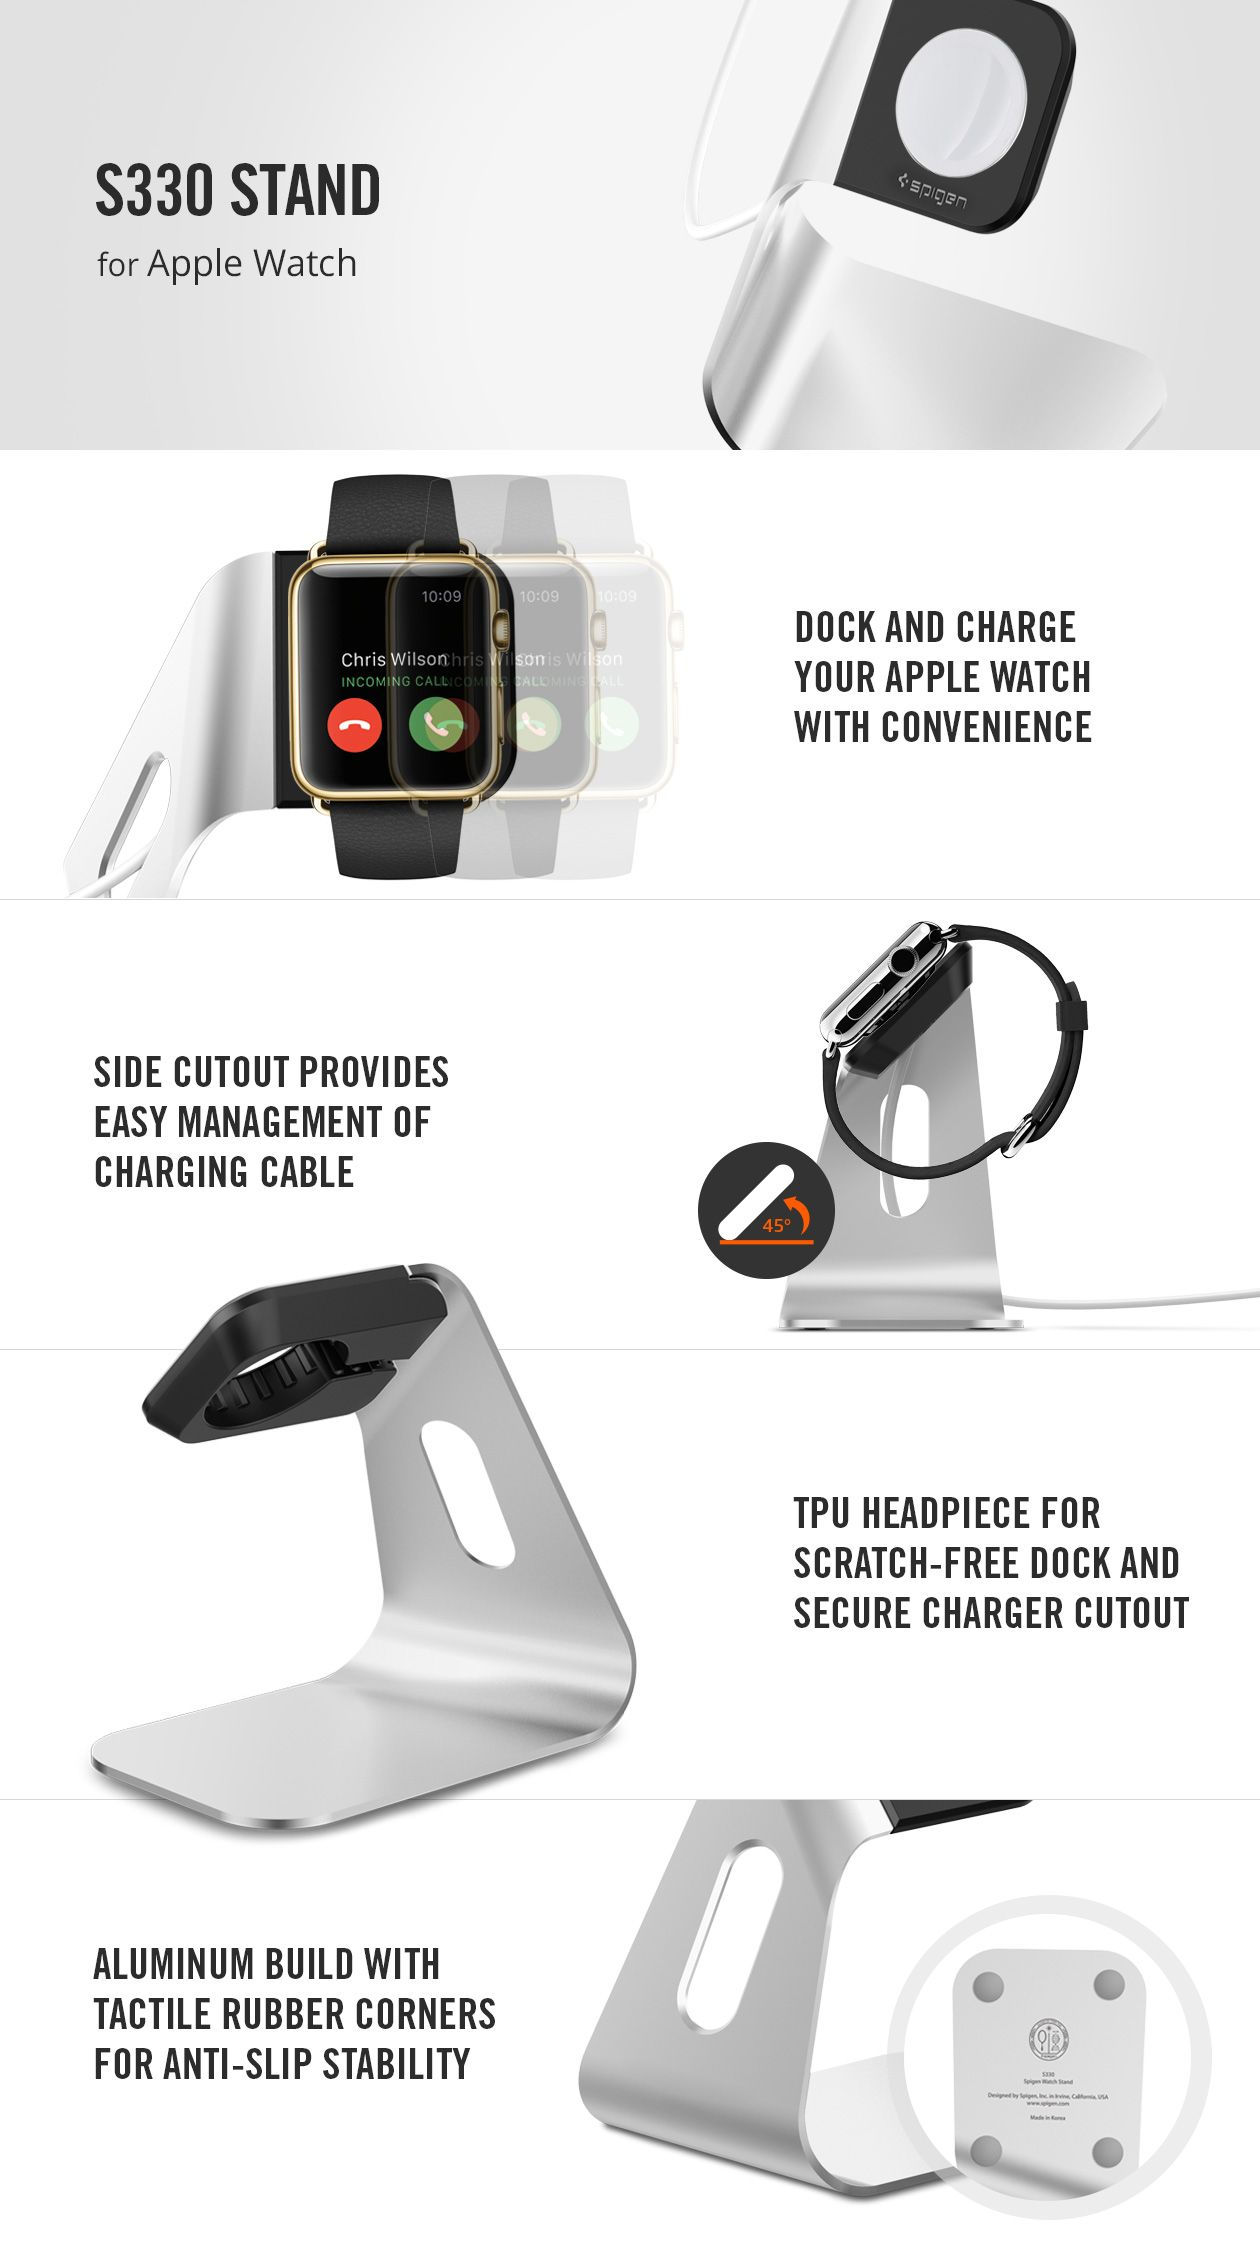 buy online 94065 1c5da Apple Watch Stand S330 | Apple Watch | Spigen apple watch, Apple ...